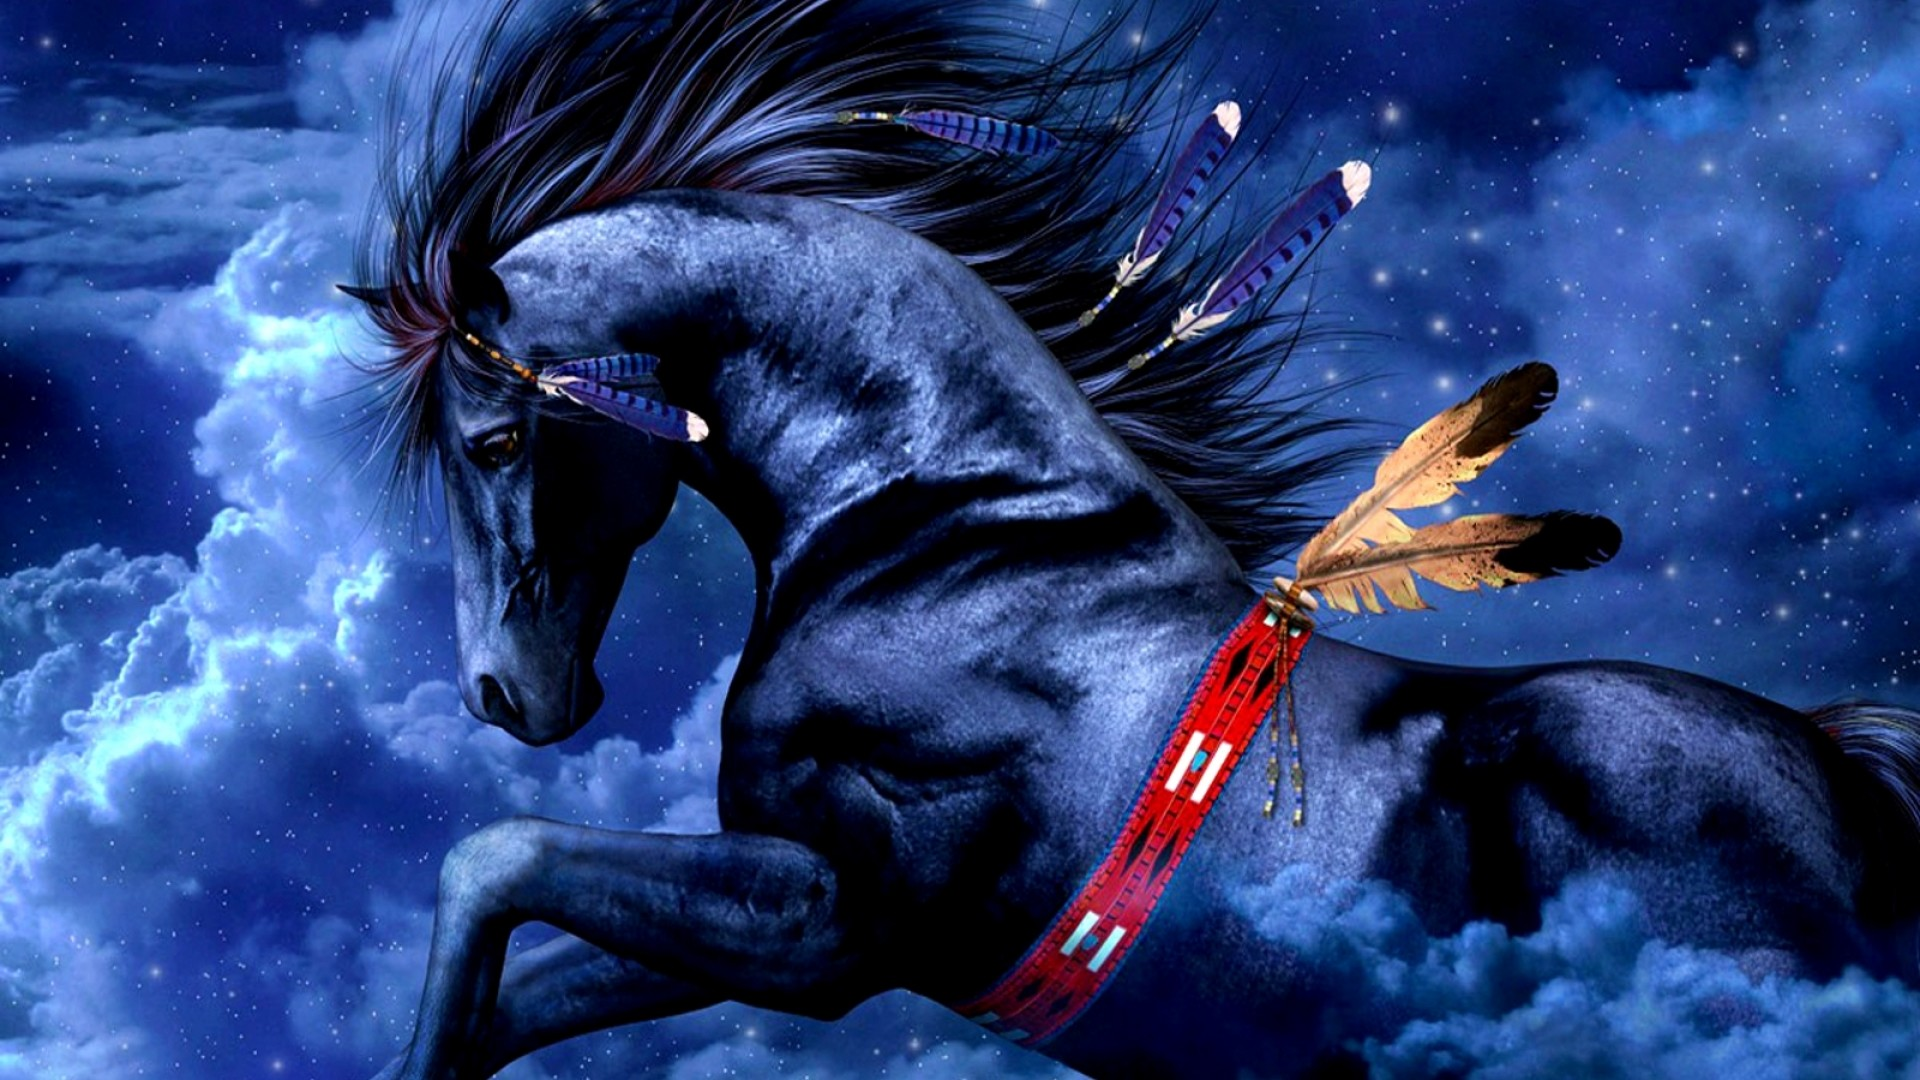 appaloosa horse amazing | HDwallpaper | Pinterest | Horse wallpaper and  Wallpaper